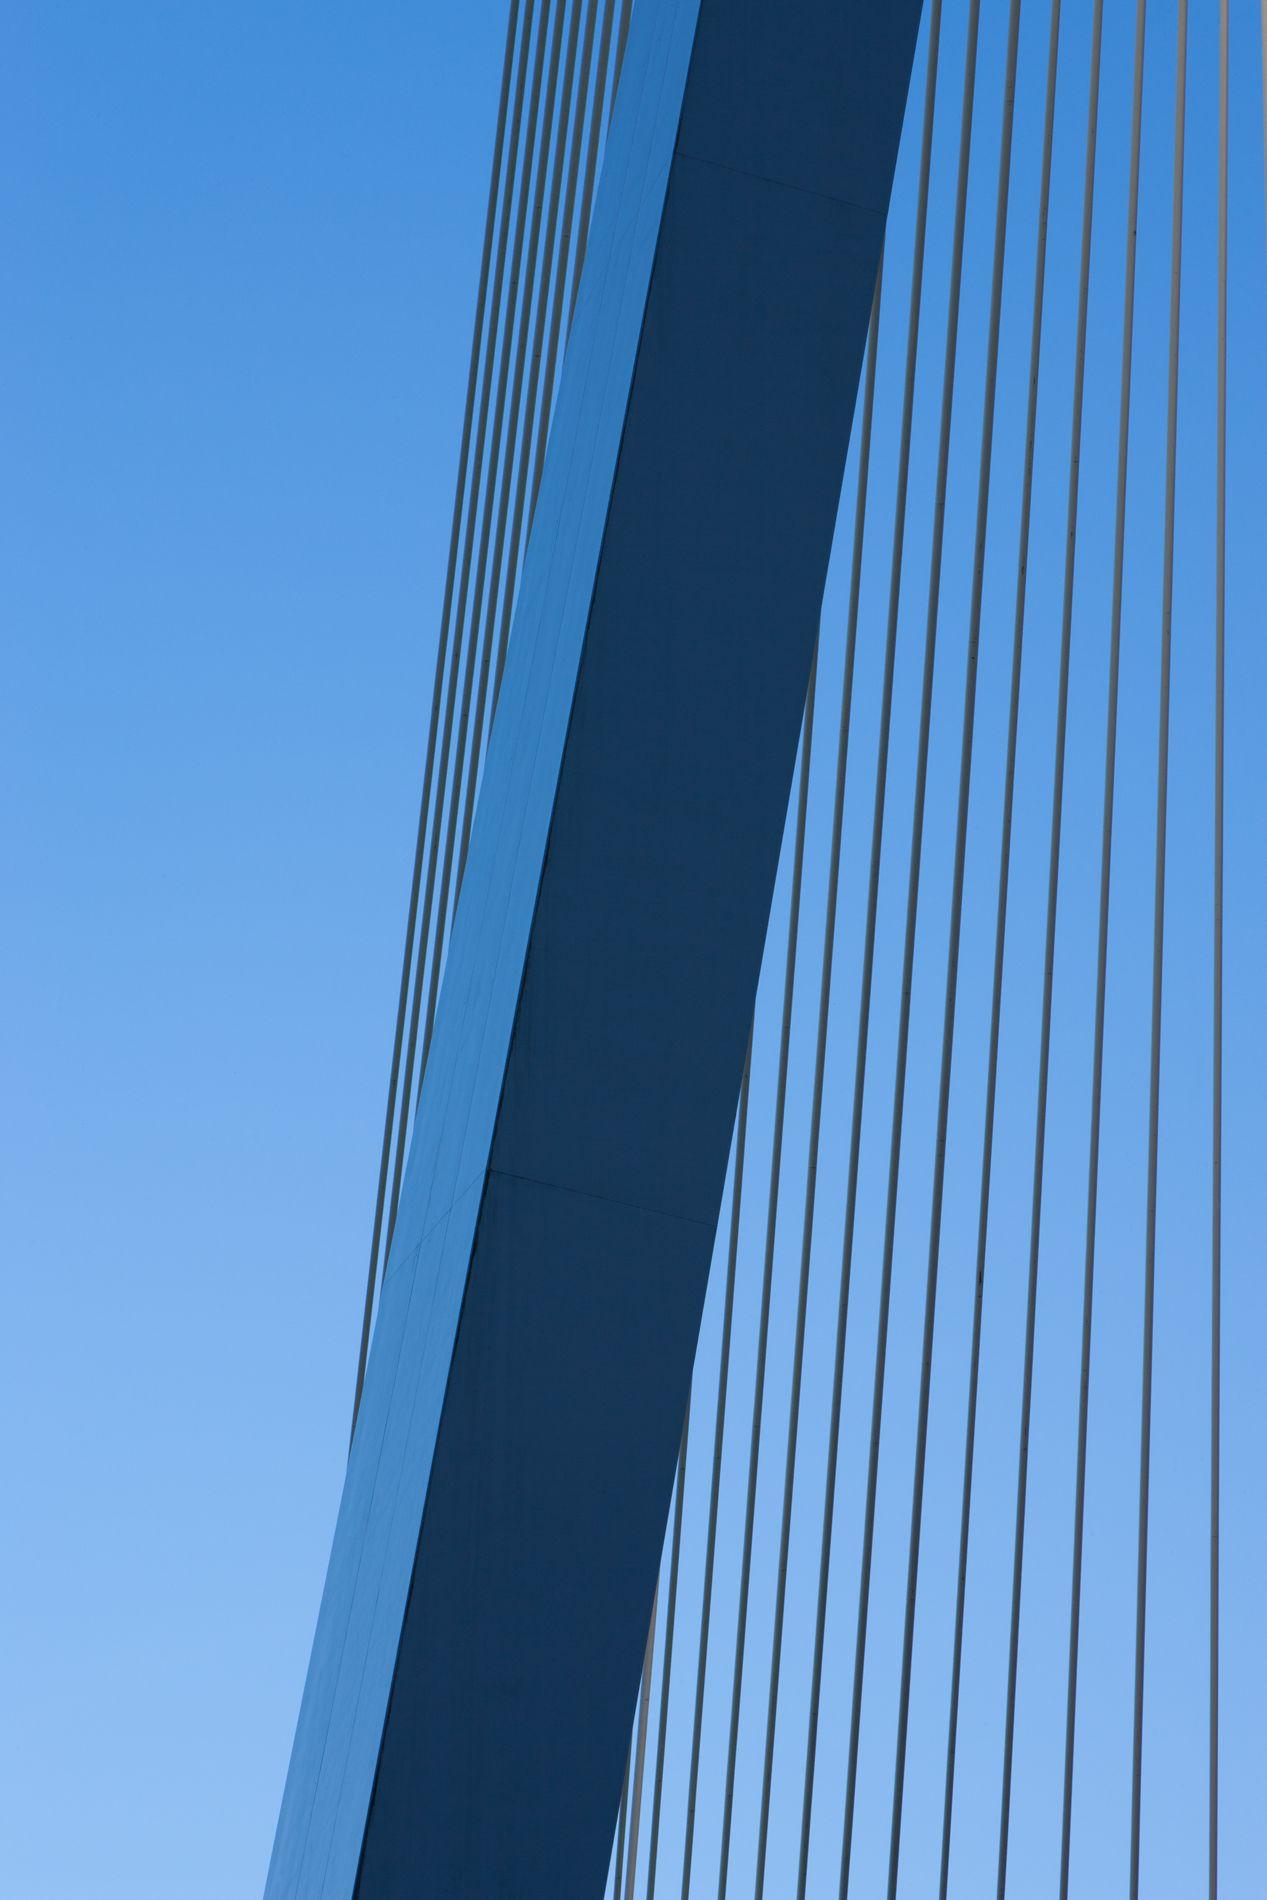 erasmusbrug, erasmus bridge